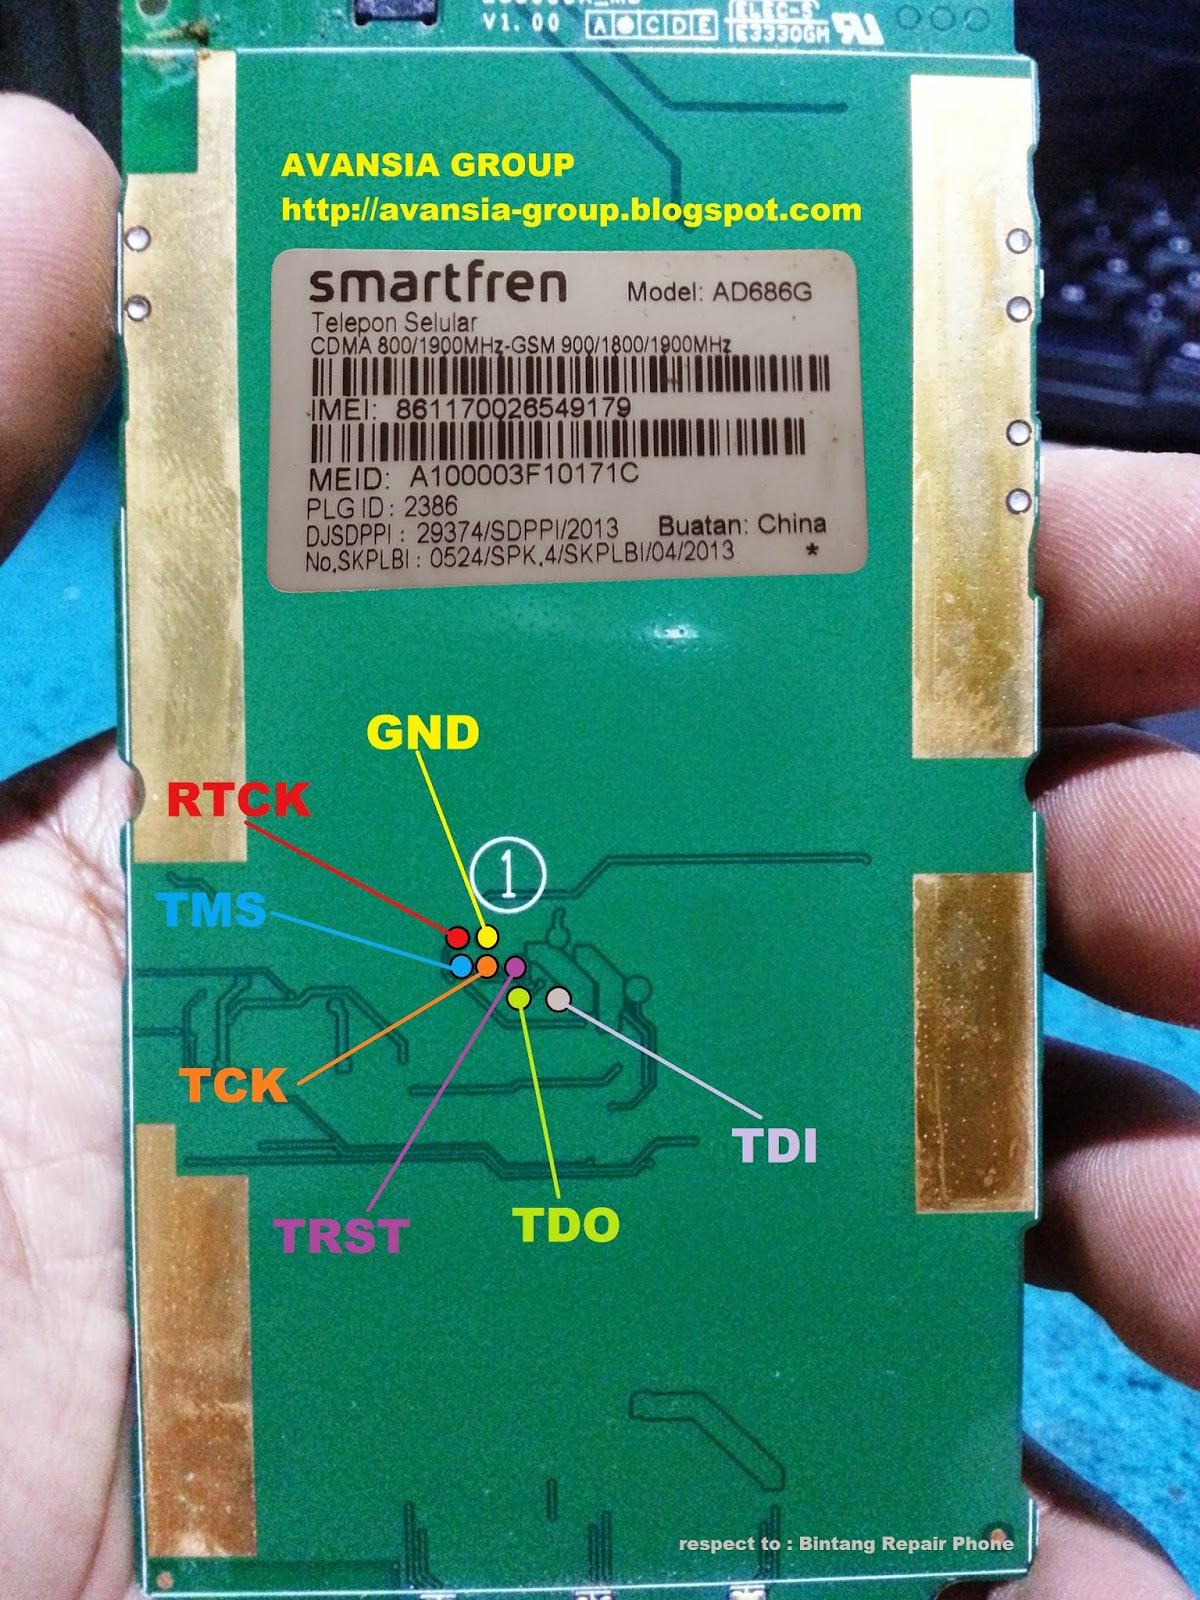 Avansia Group Plug In Smartfreen Andormax C Ad686g Bb 9220 9320